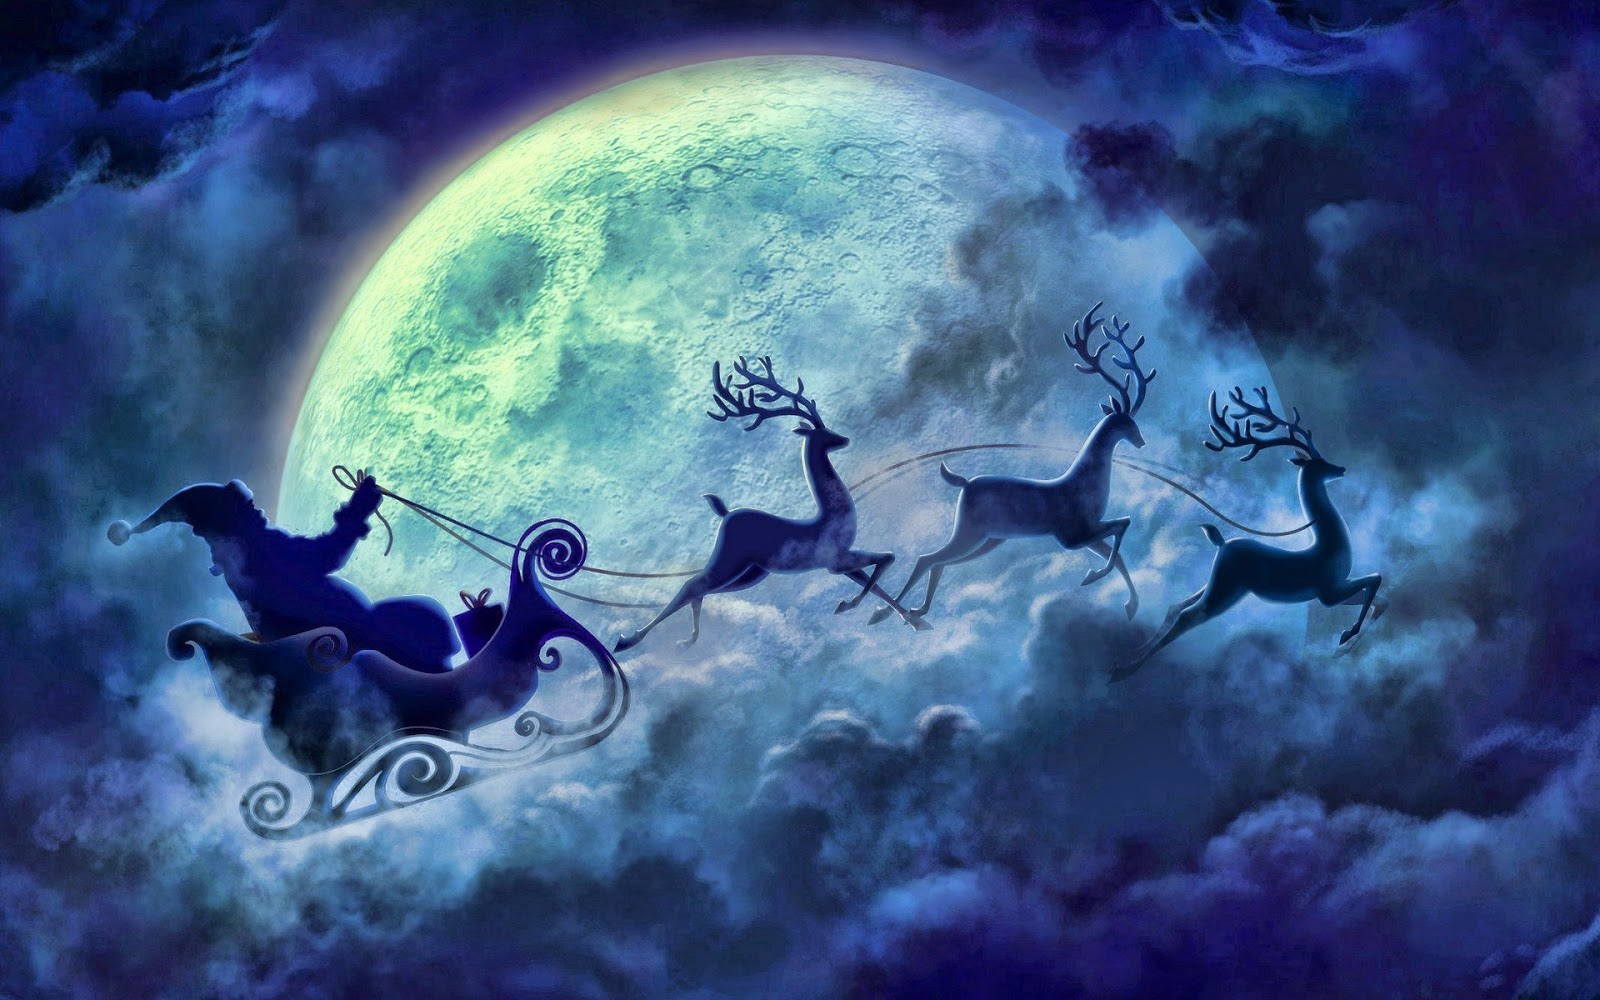 Sfondi natalizi desktop animati adamsrants for Sfondi natale 3d